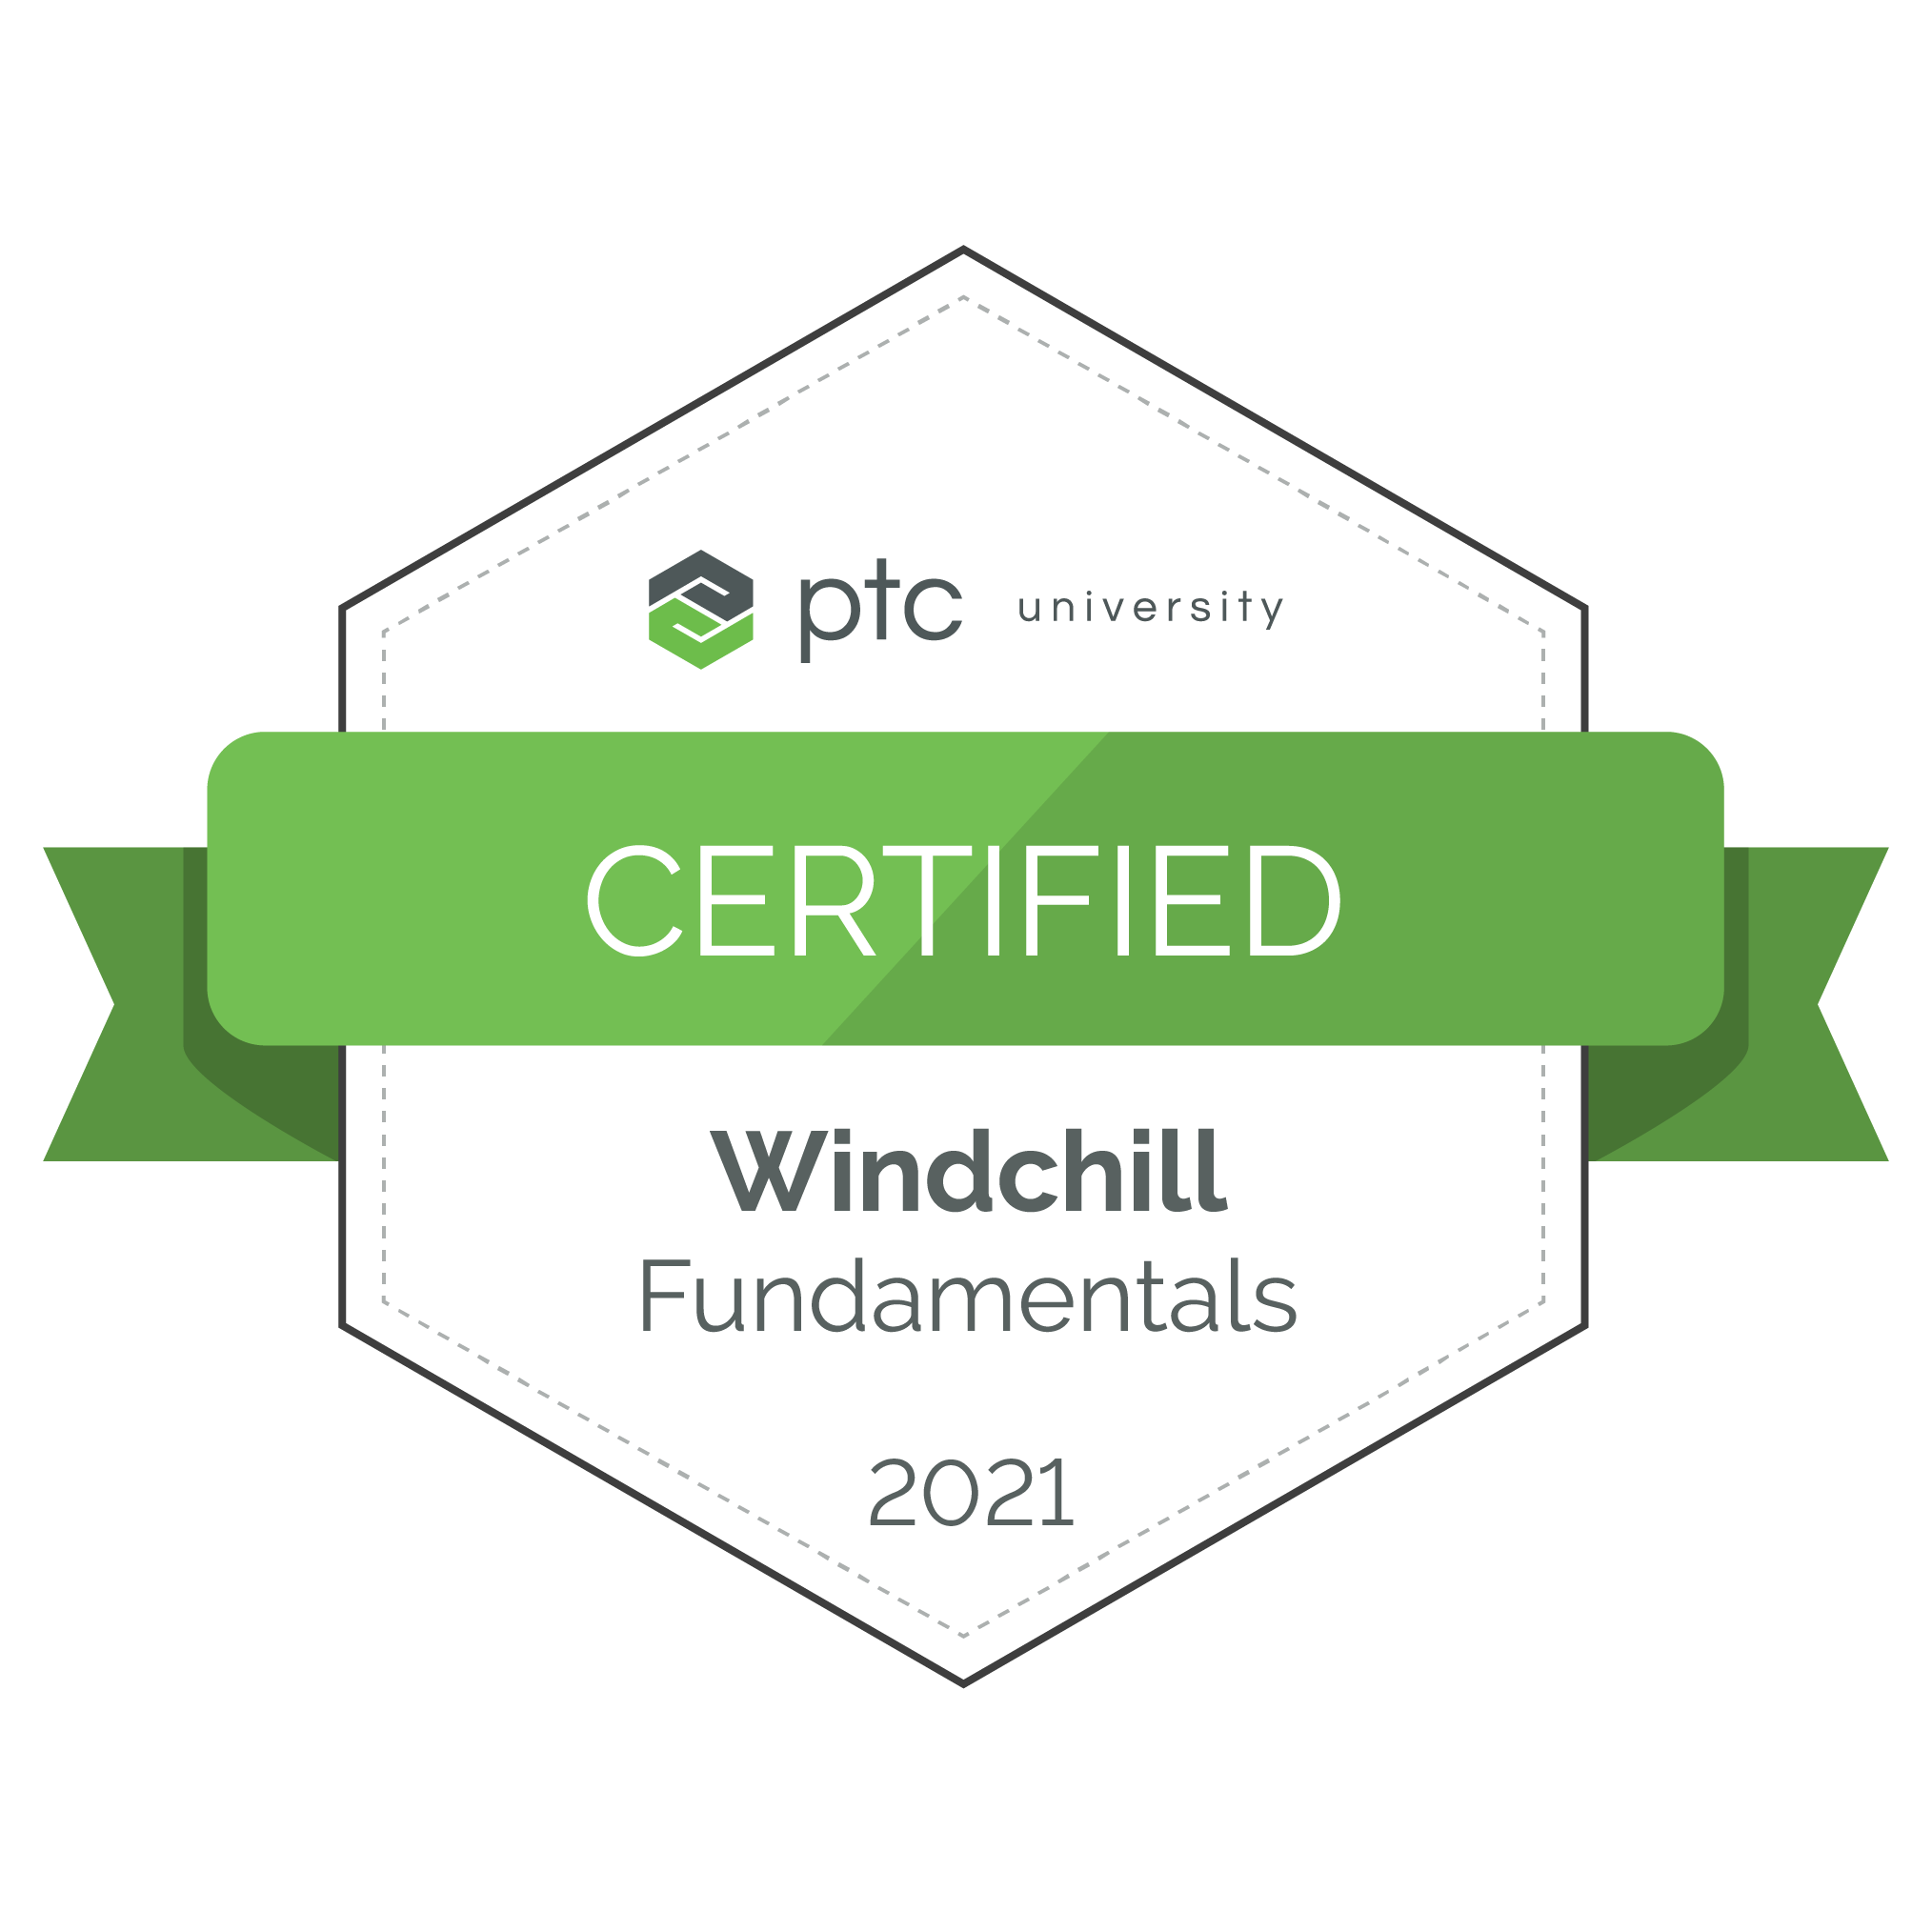 Windchill Fundamentals Certification 2021